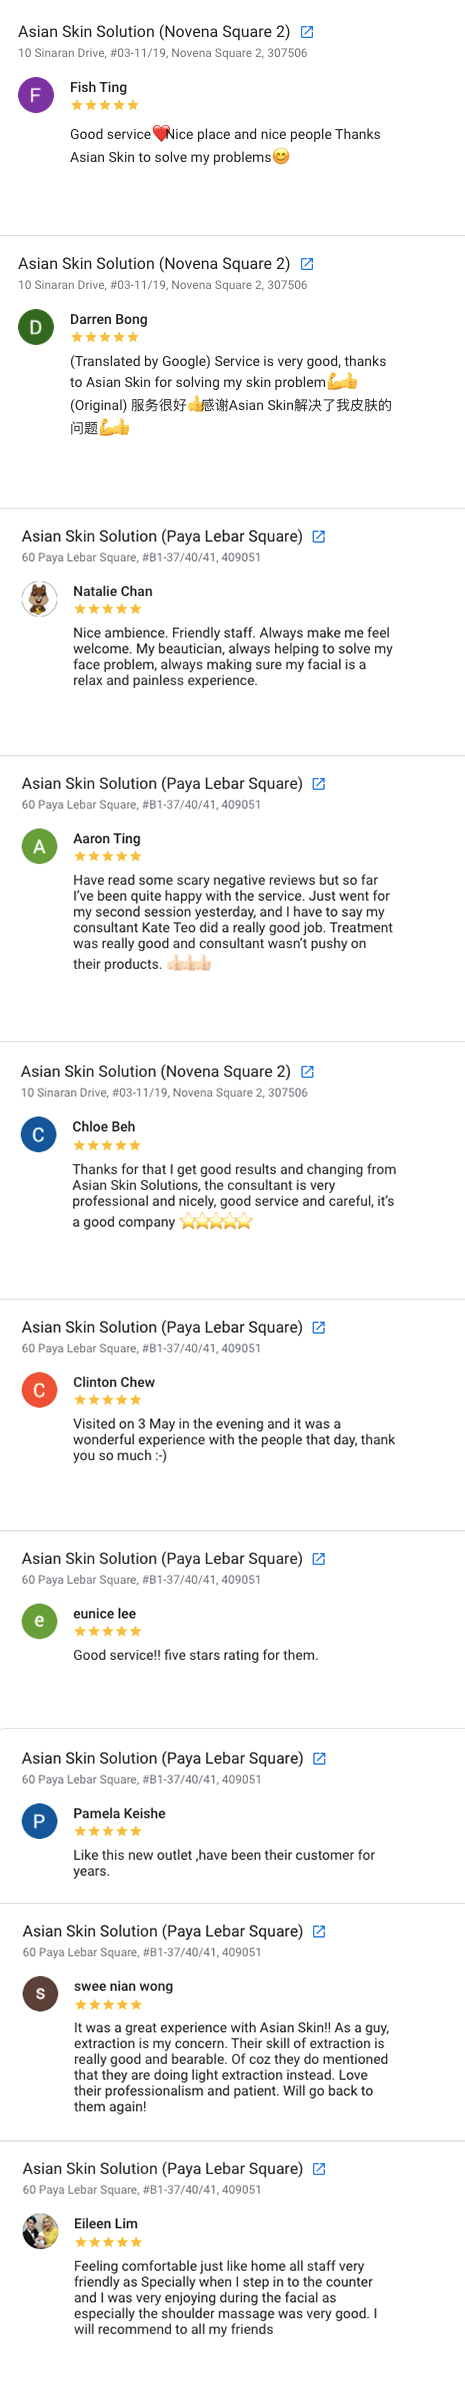 ASS_LP_reviews.png